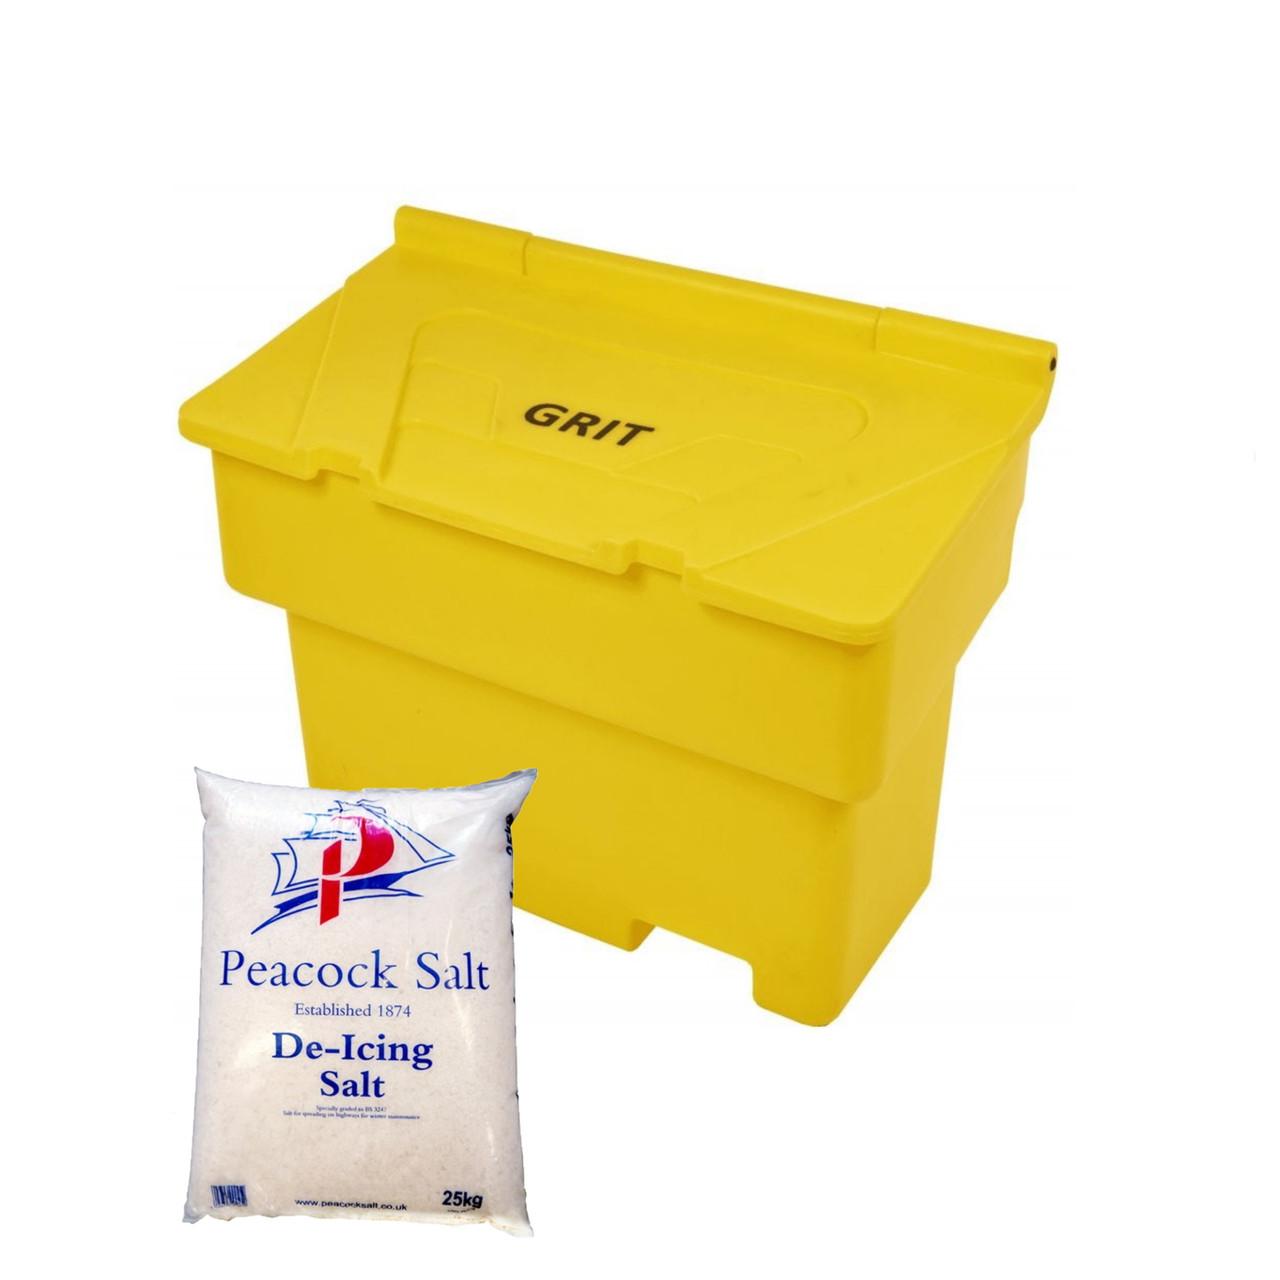 200 Litre grit salt box bin - optional salt